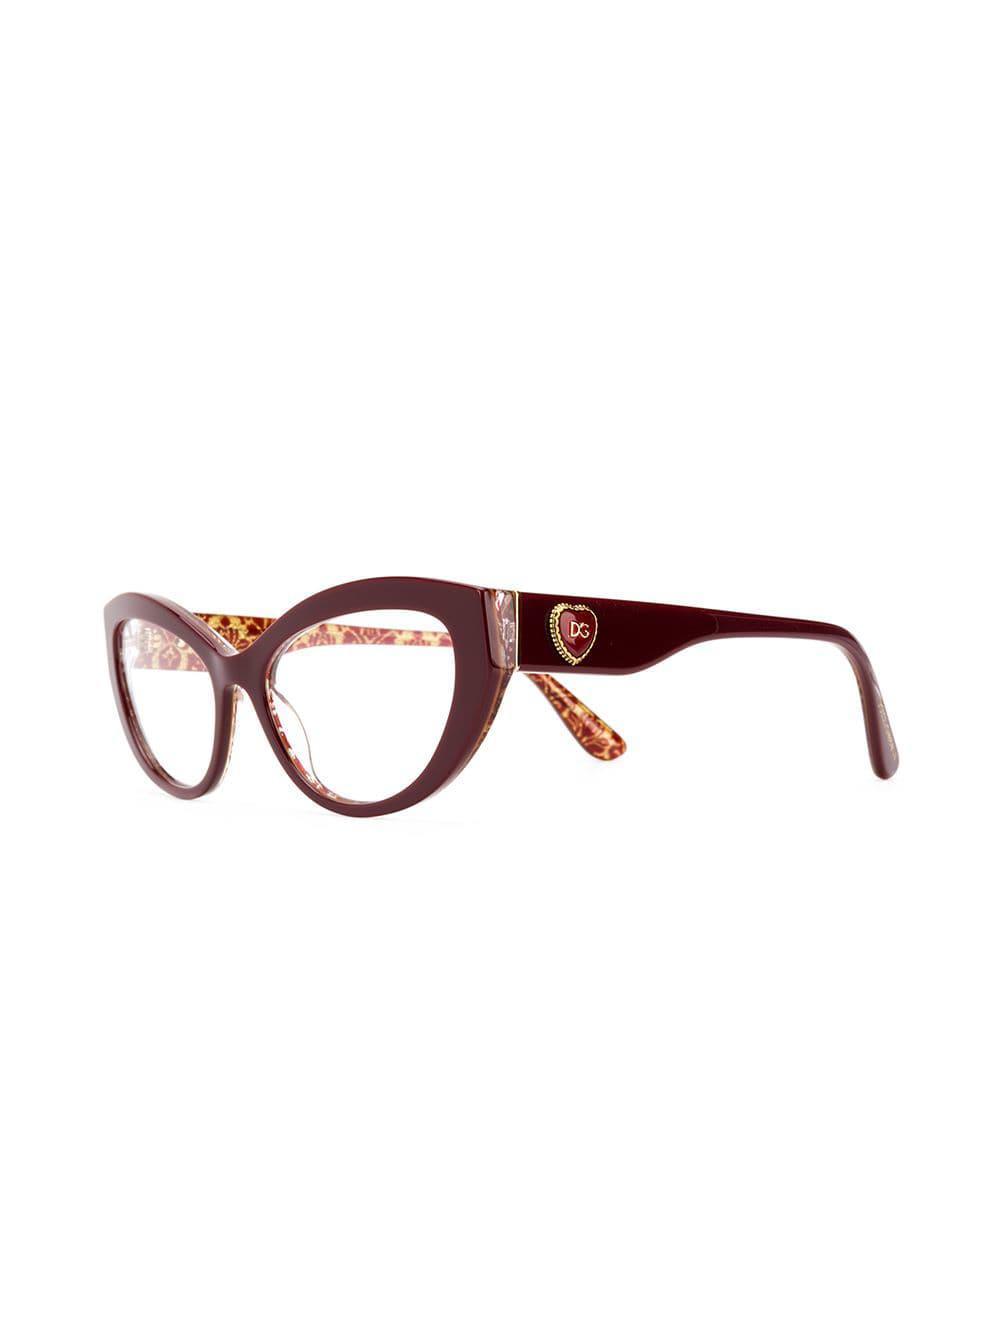 cd10f5be4fa Dolce   Gabbana - Red Cat-eye Glasses - Lyst. View fullscreen